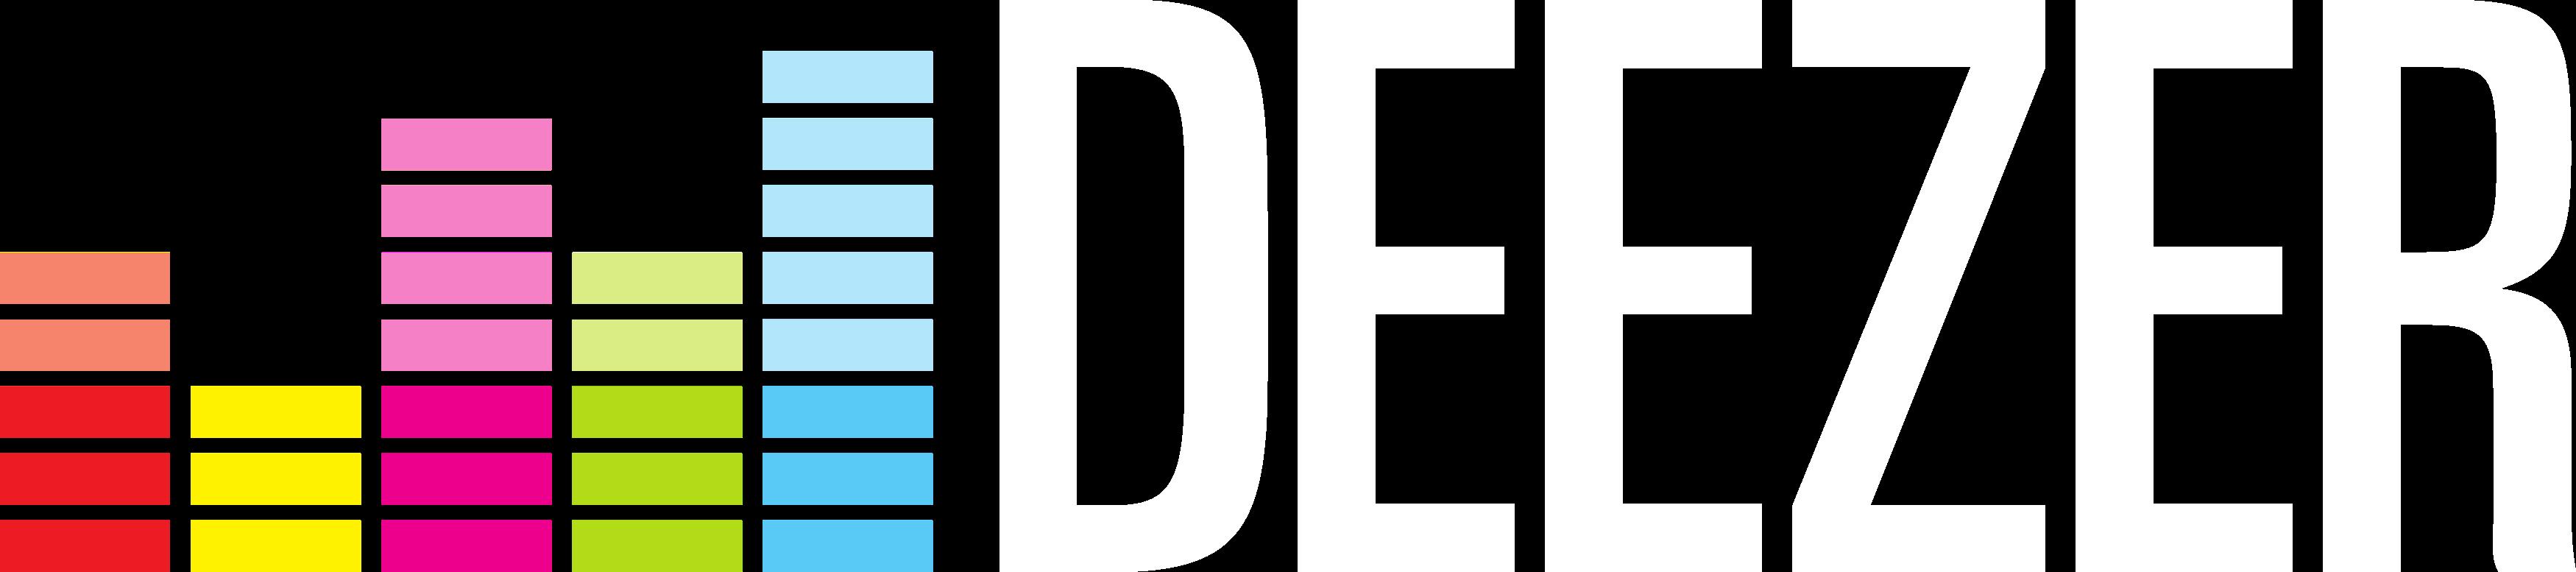 deezer logo 0 - Deezer Logo